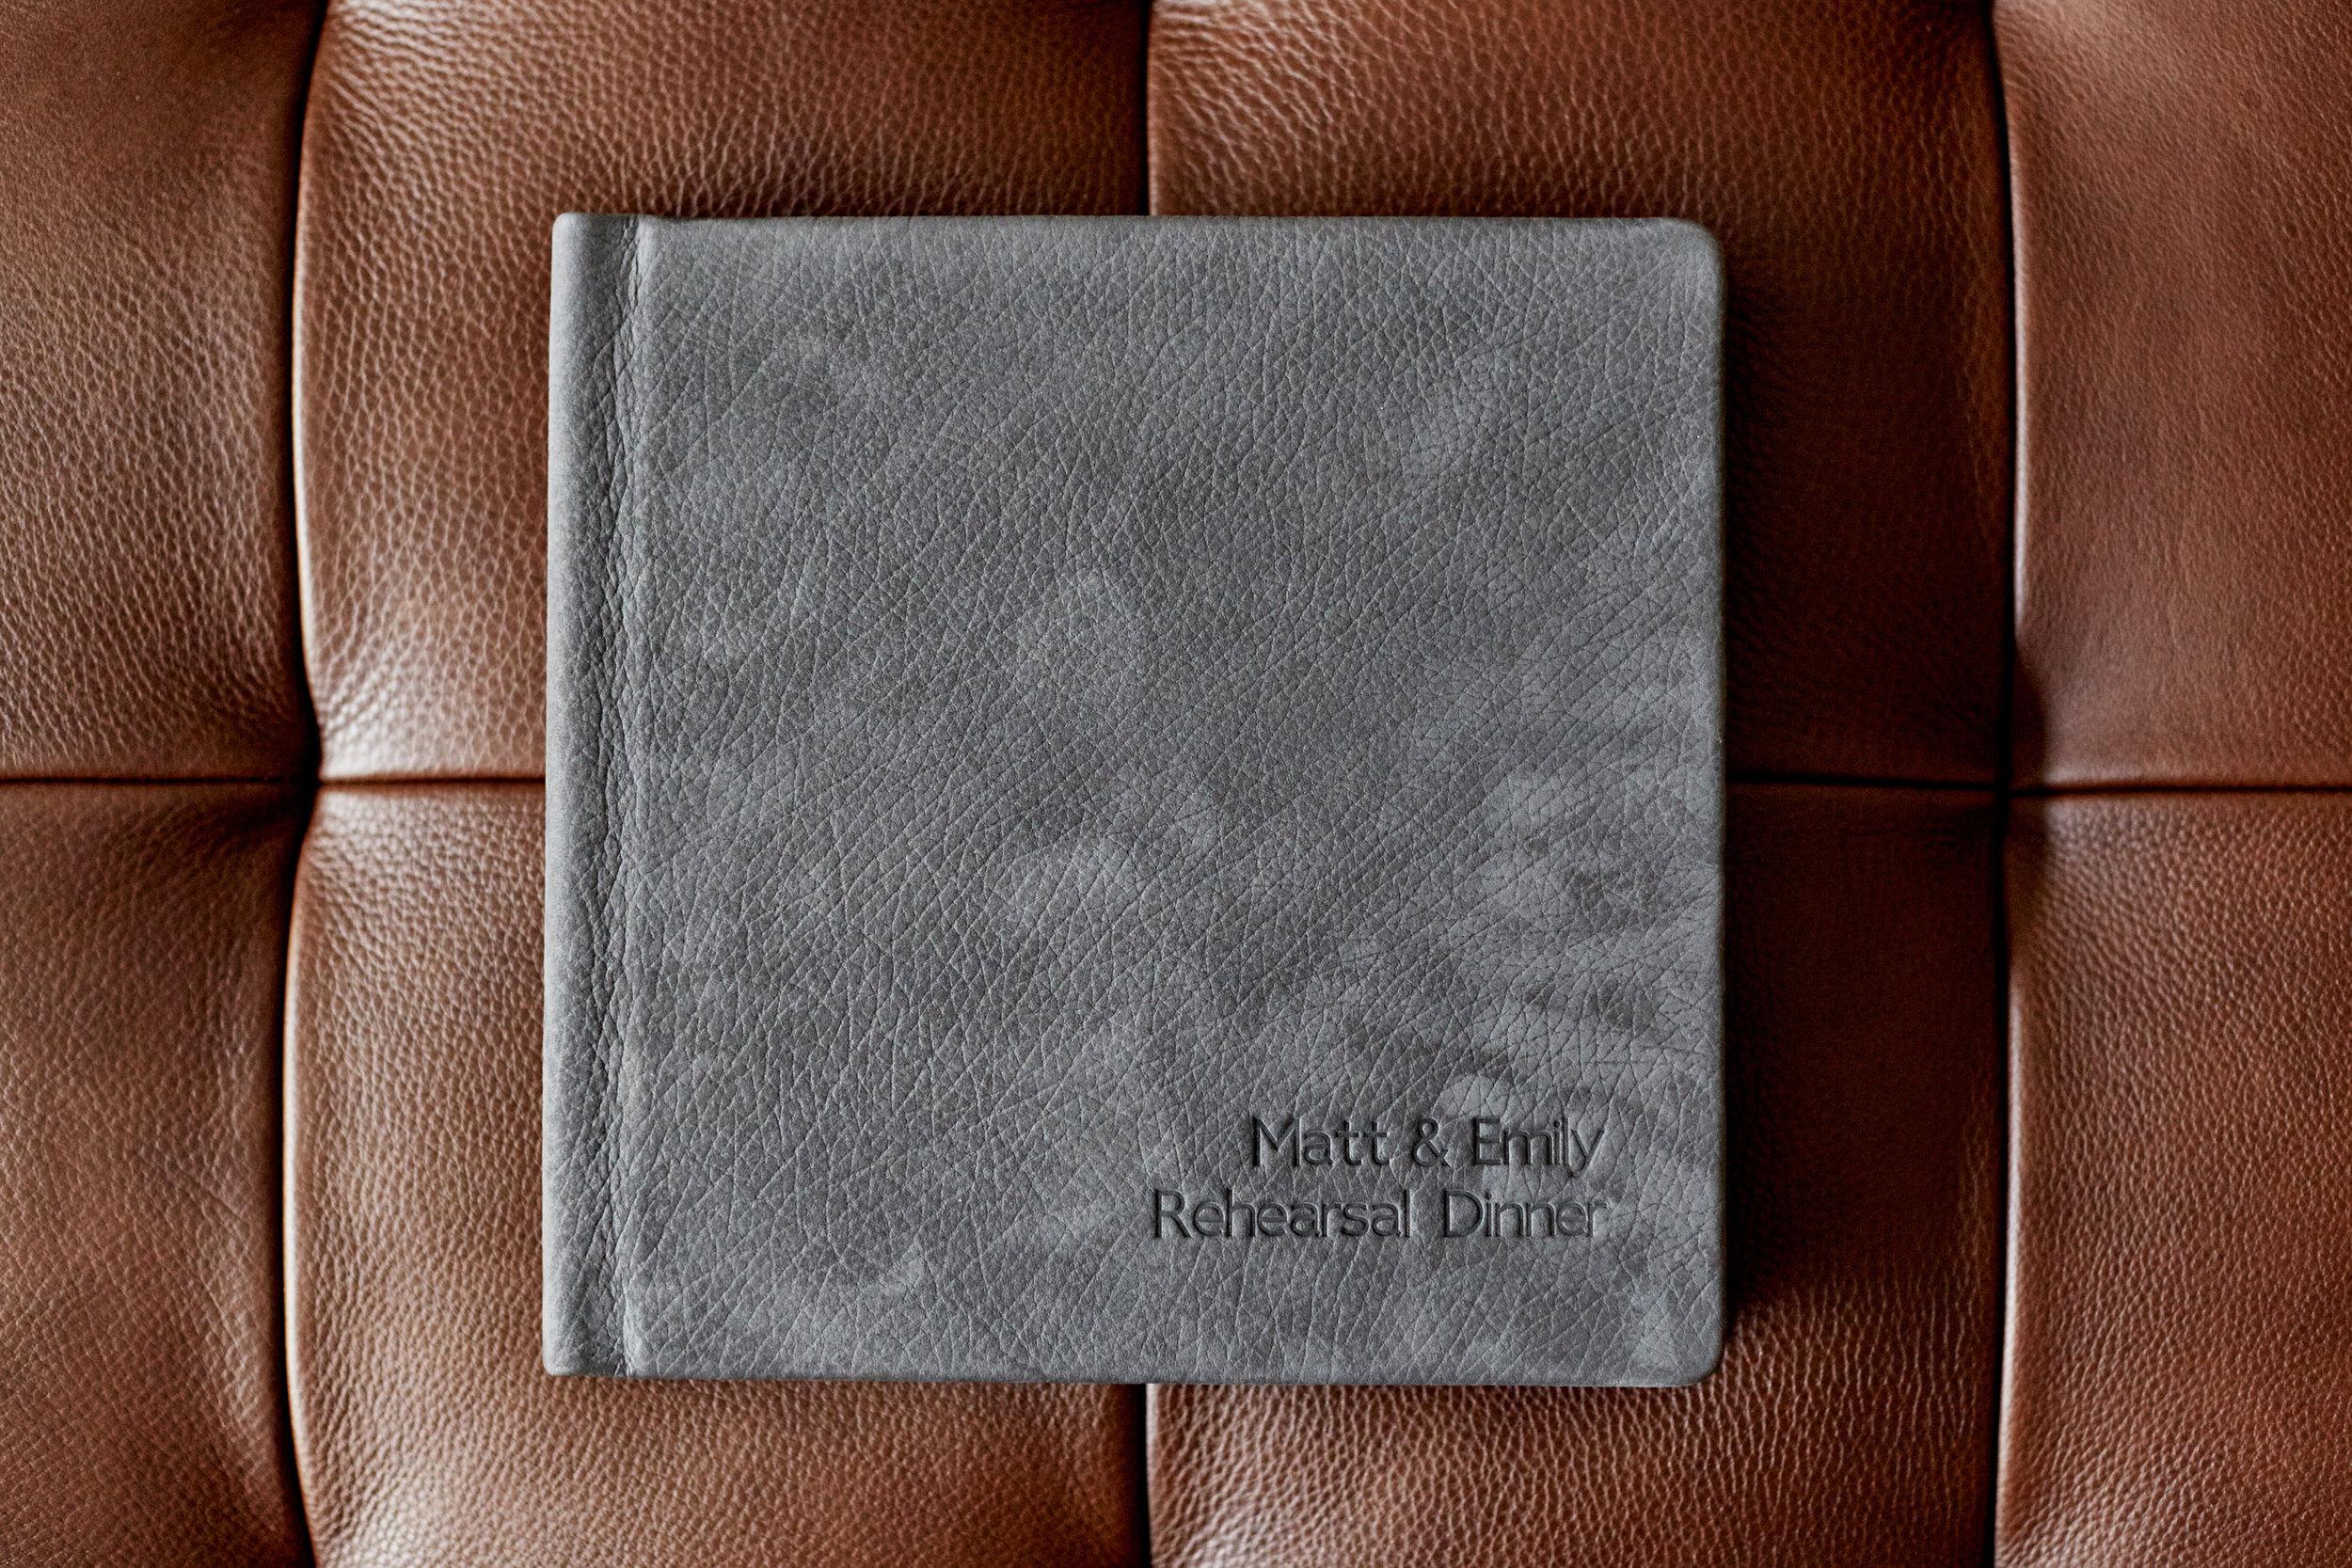 nickfayweddings-albums-small-001.jpg